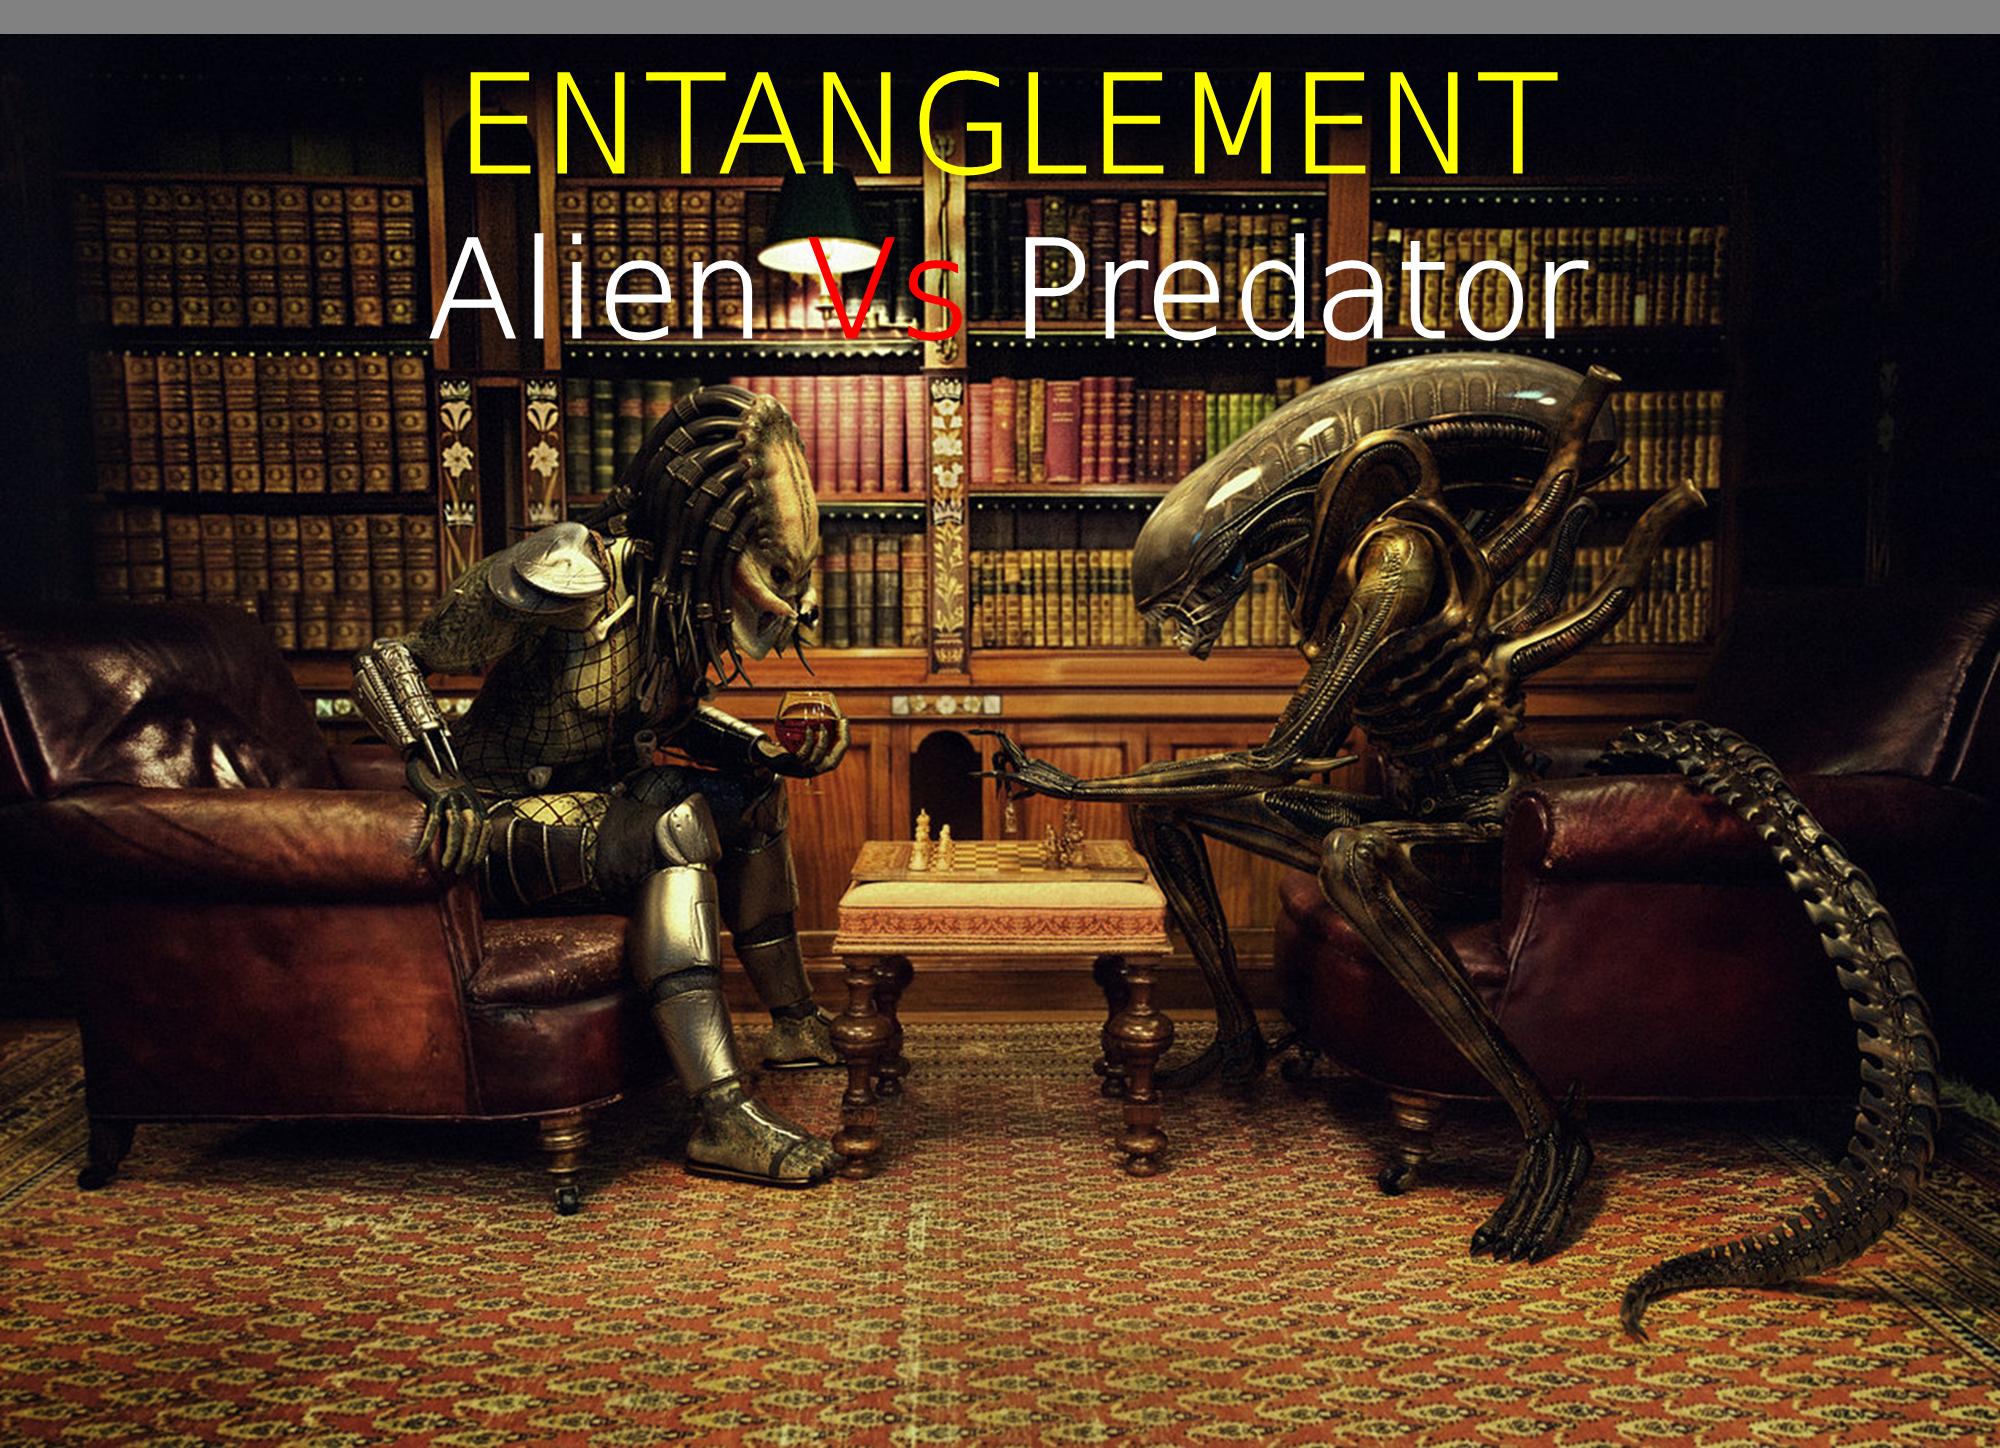 alien and predator relationship